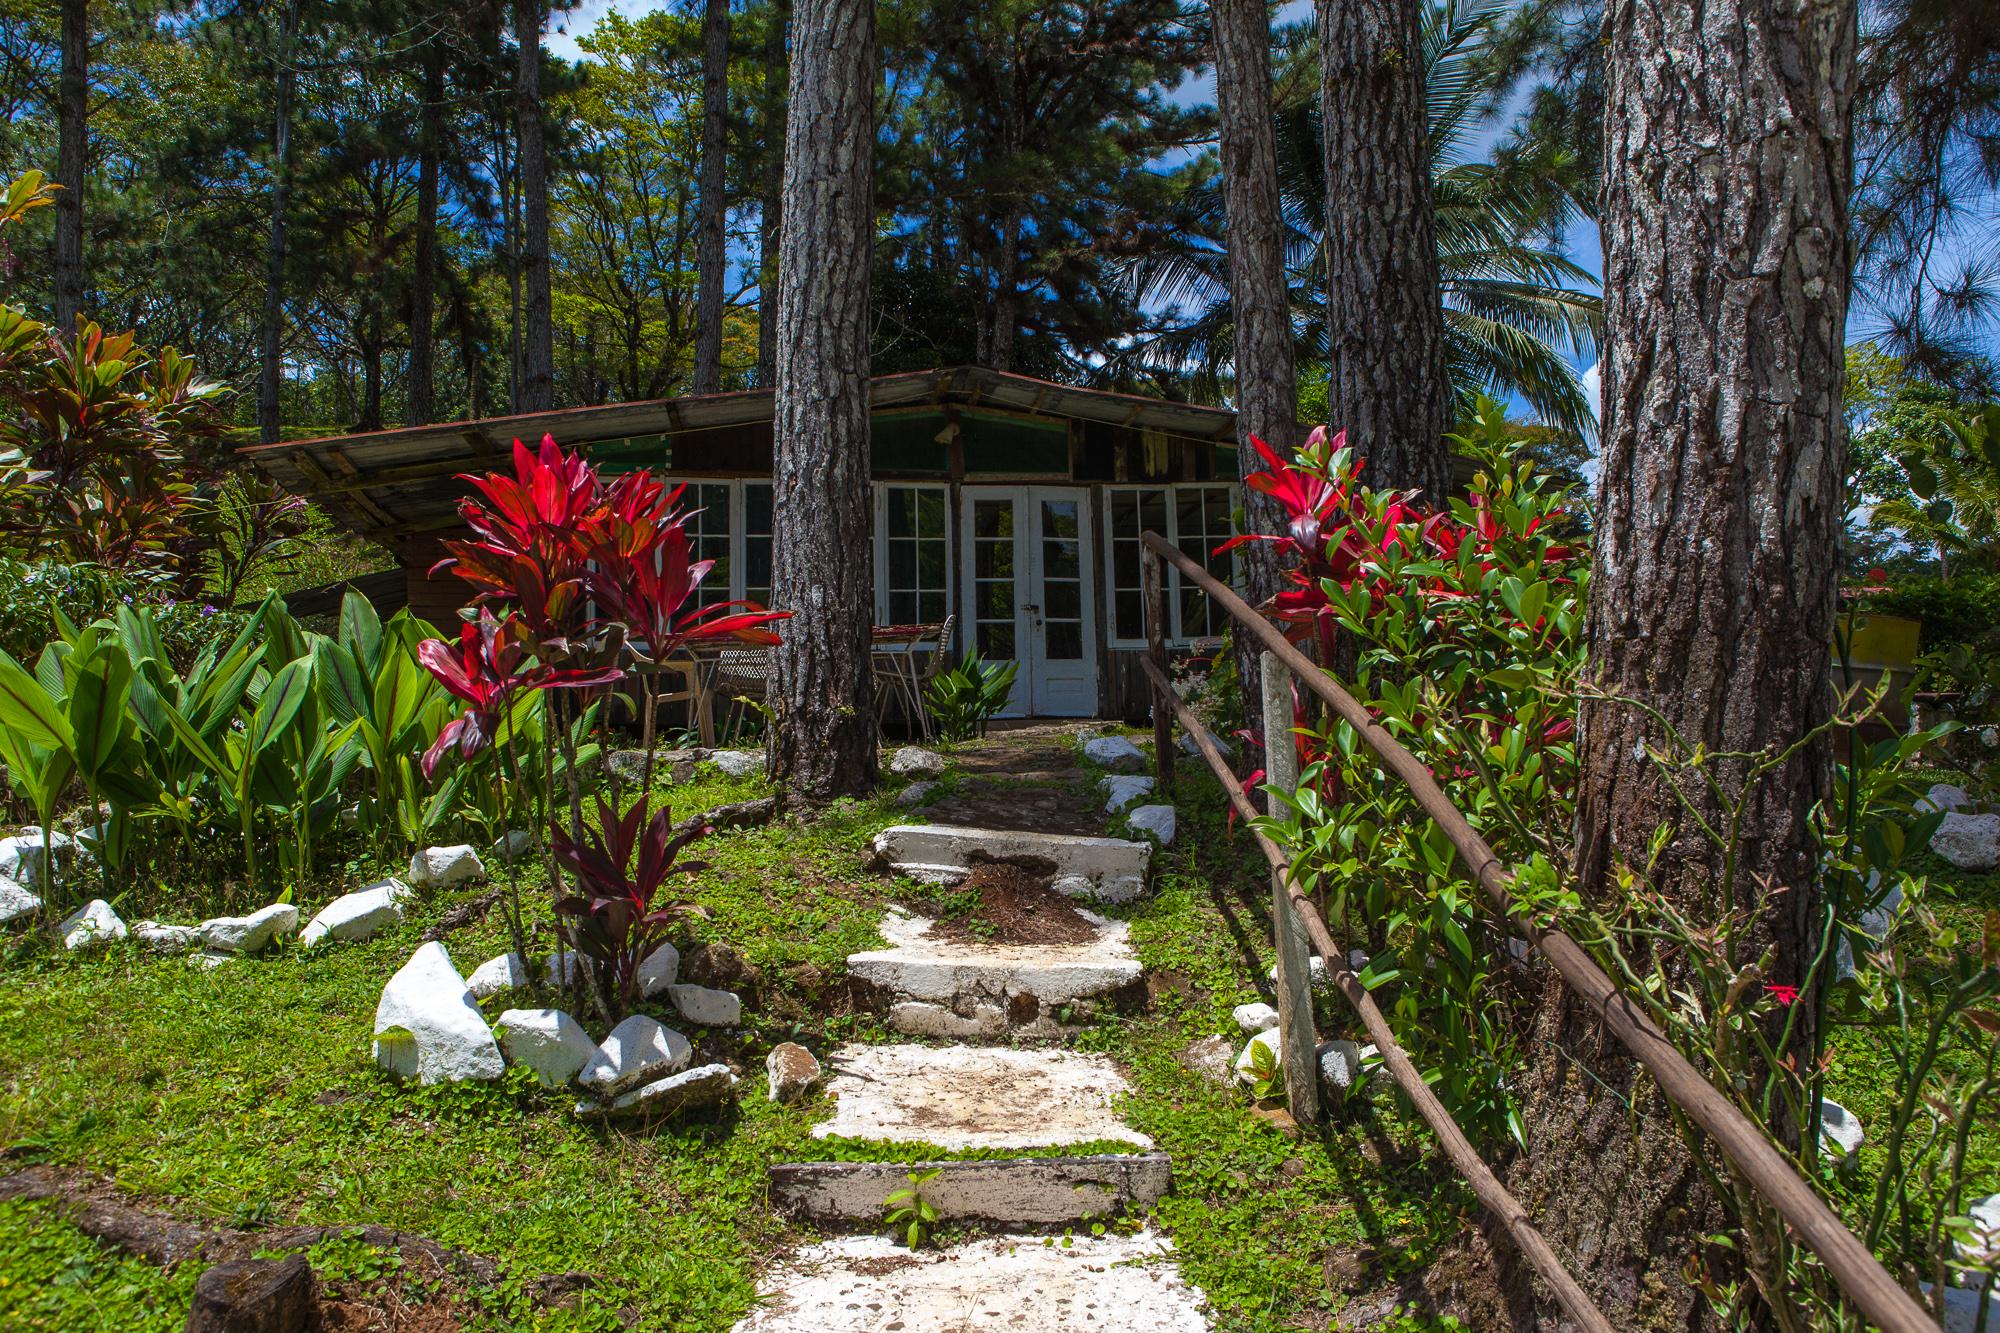 Panama: Cerro Azul and Cabanas 4×4